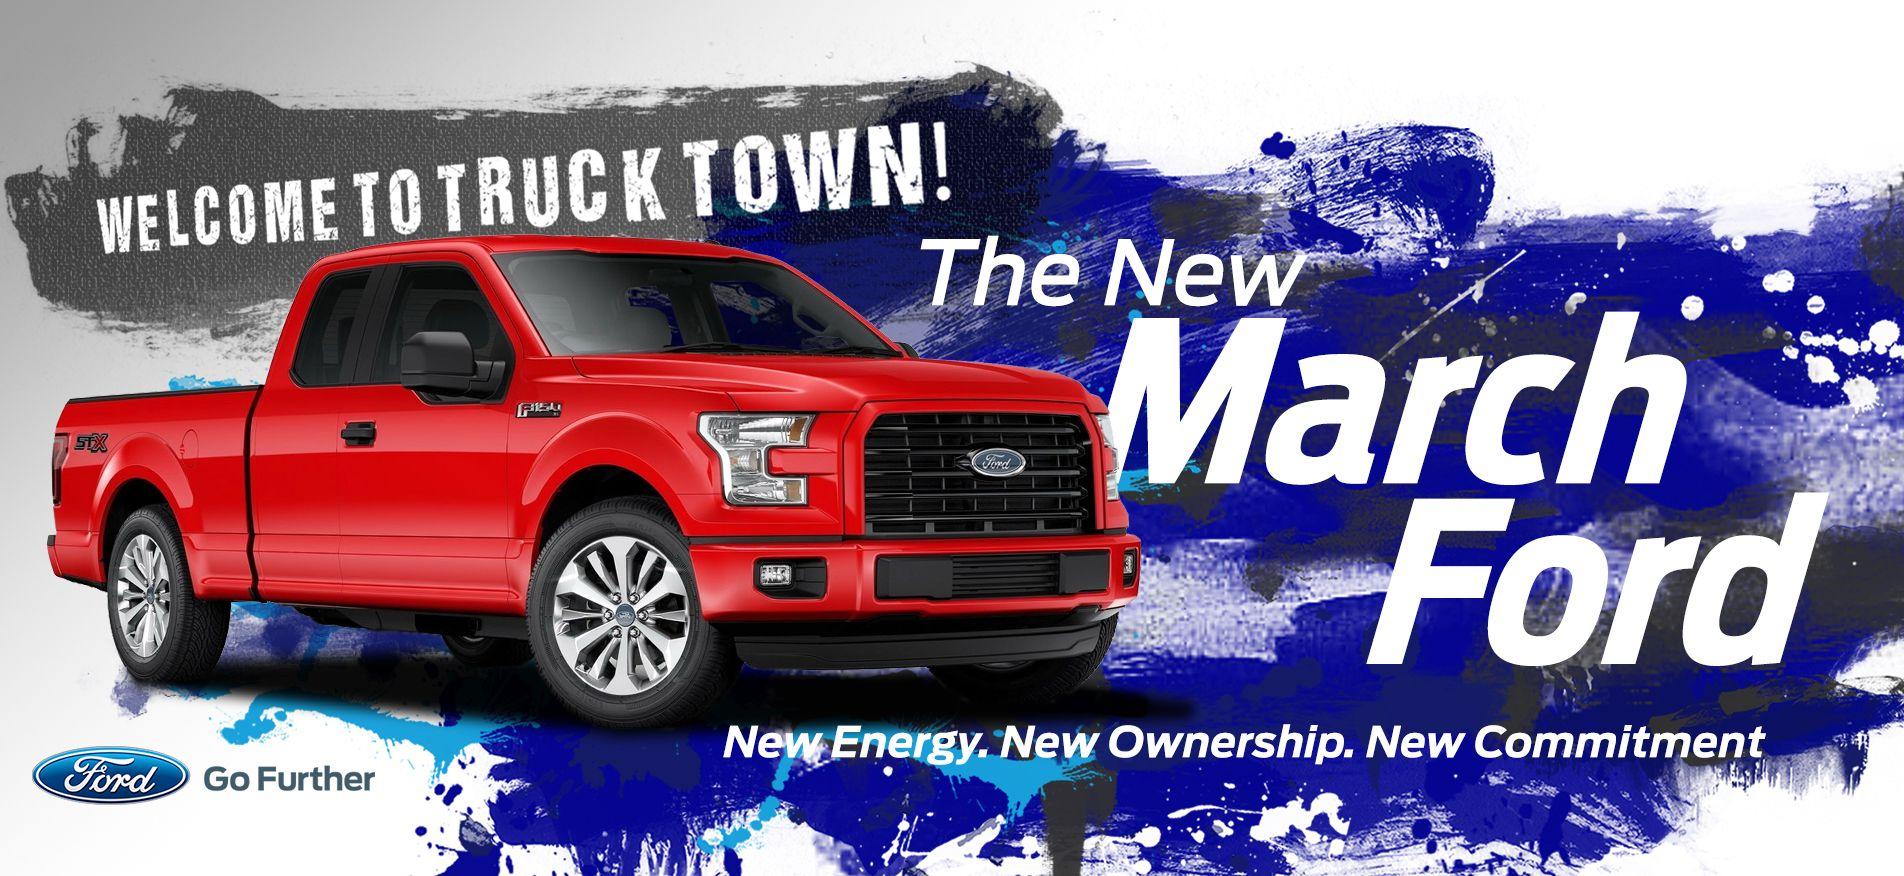 truck town ford f-150 ottawa valley kanata